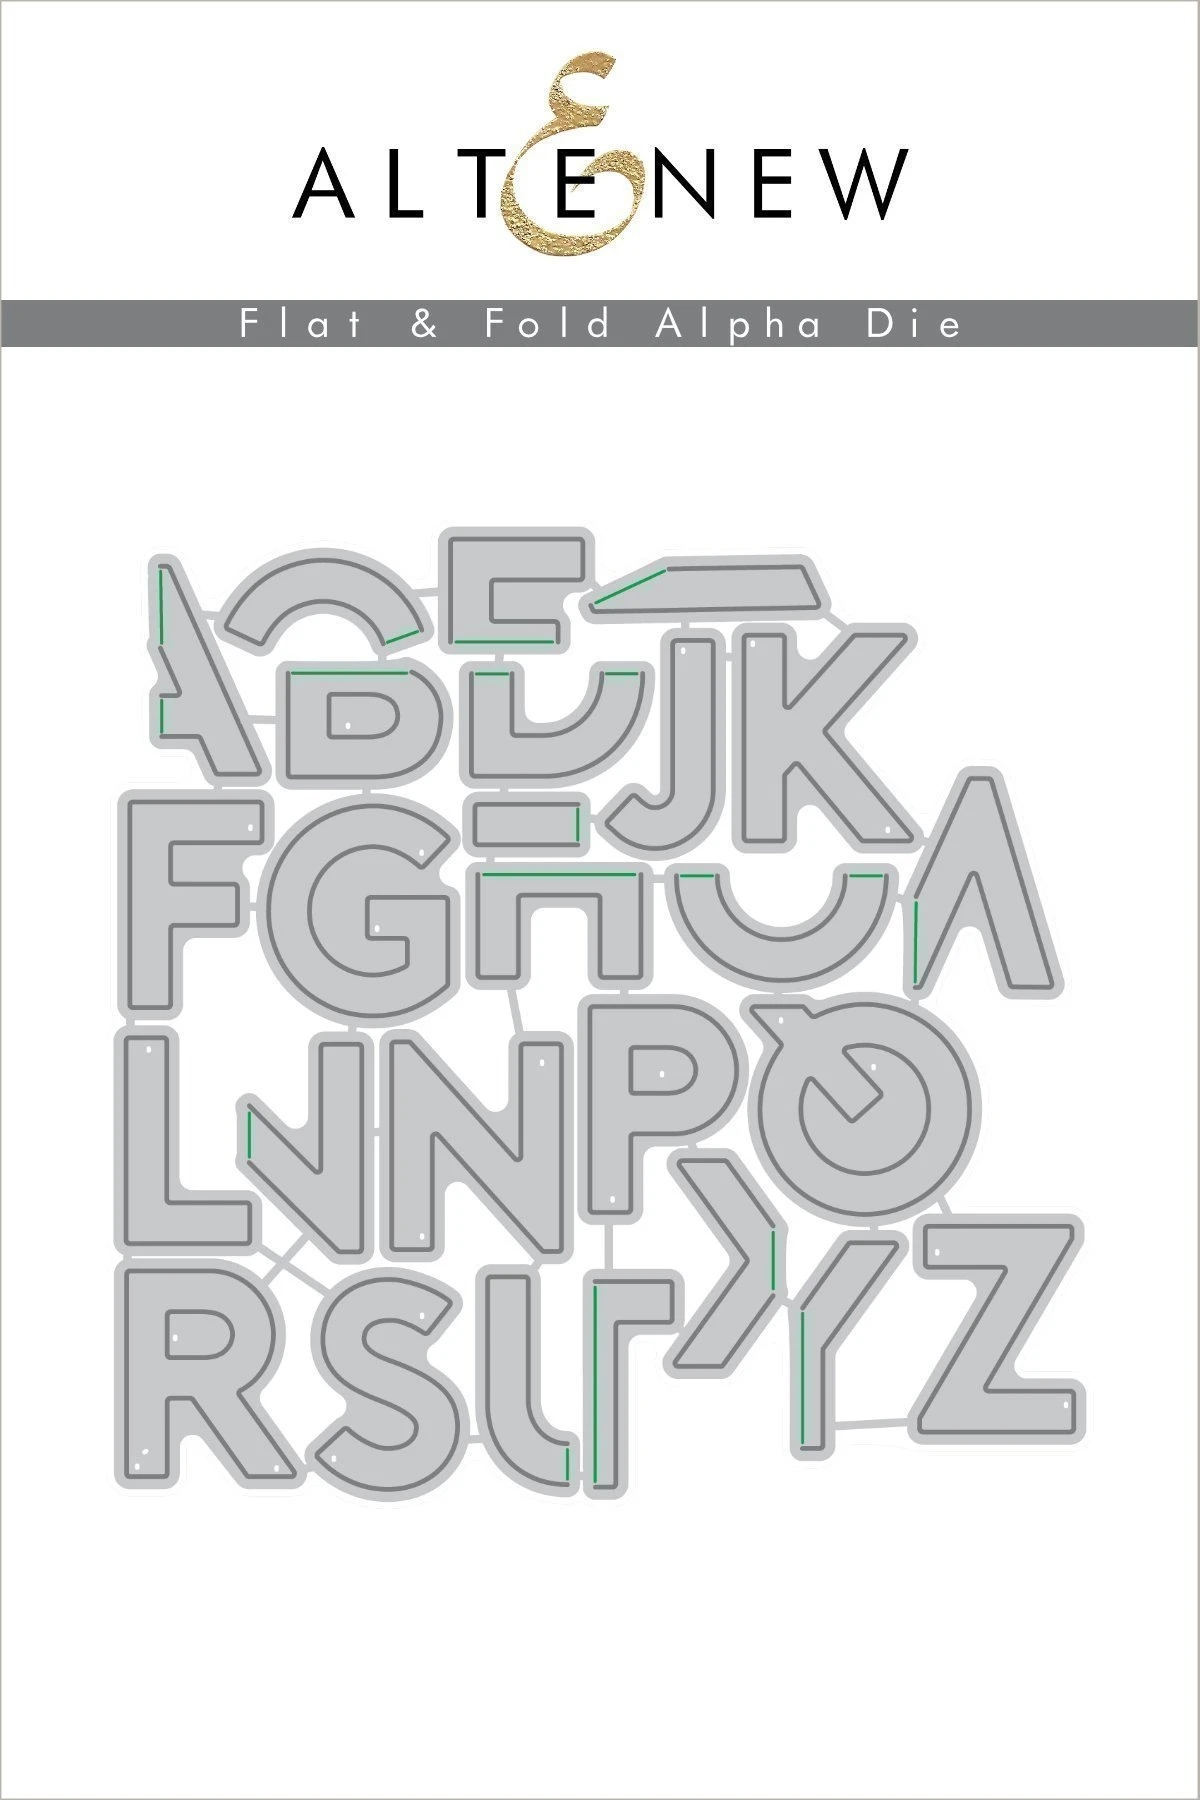 2020 Metal Cutting Dies Folded Letters Die Cut Scrapbooking Paper Craft Handmade Card Punch Art Cutter Decorative Stencil